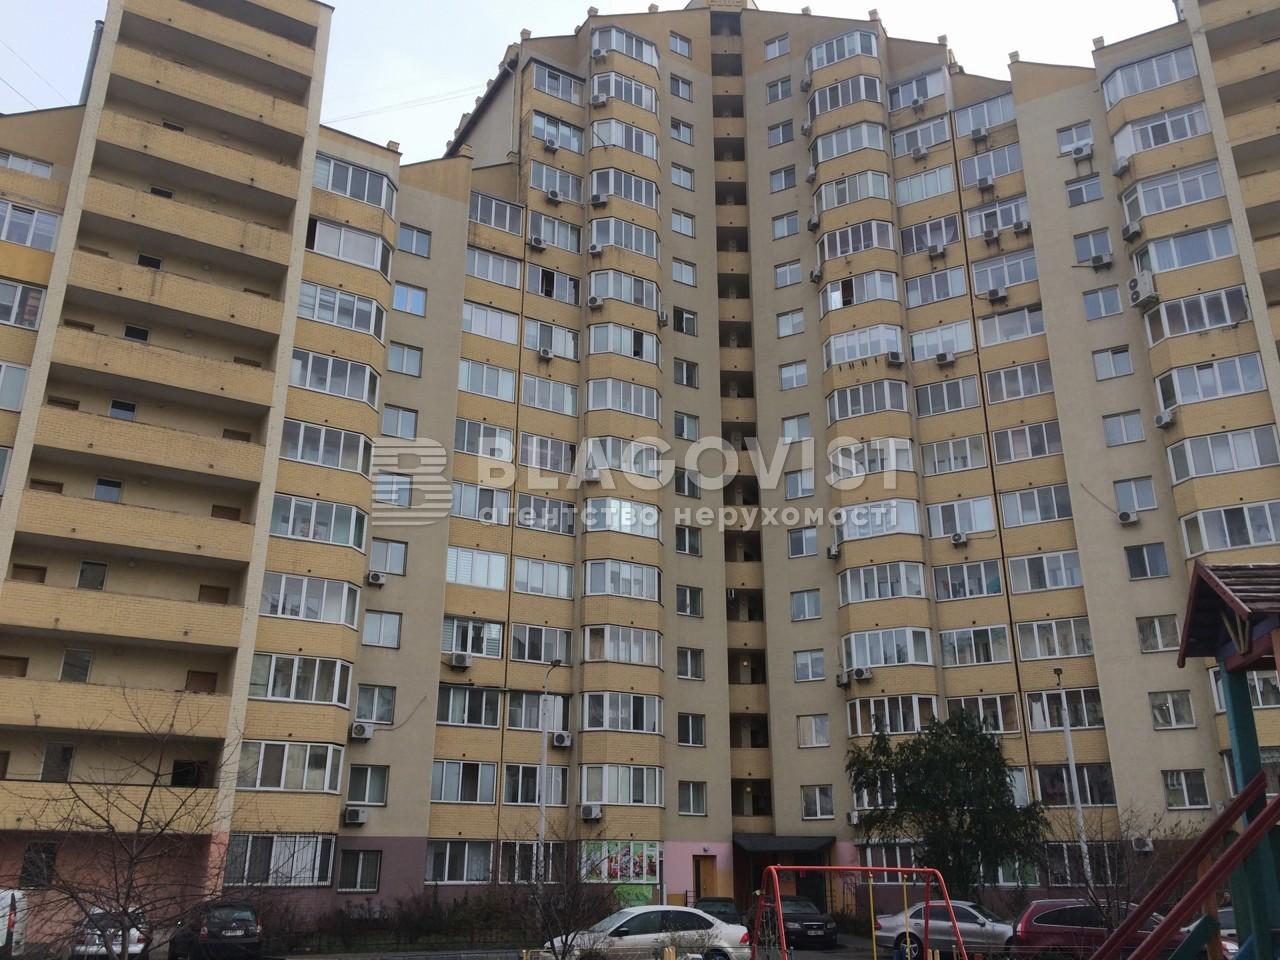 Квартира Z-106761, Тростянецкая, 49, Киев - Фото 11